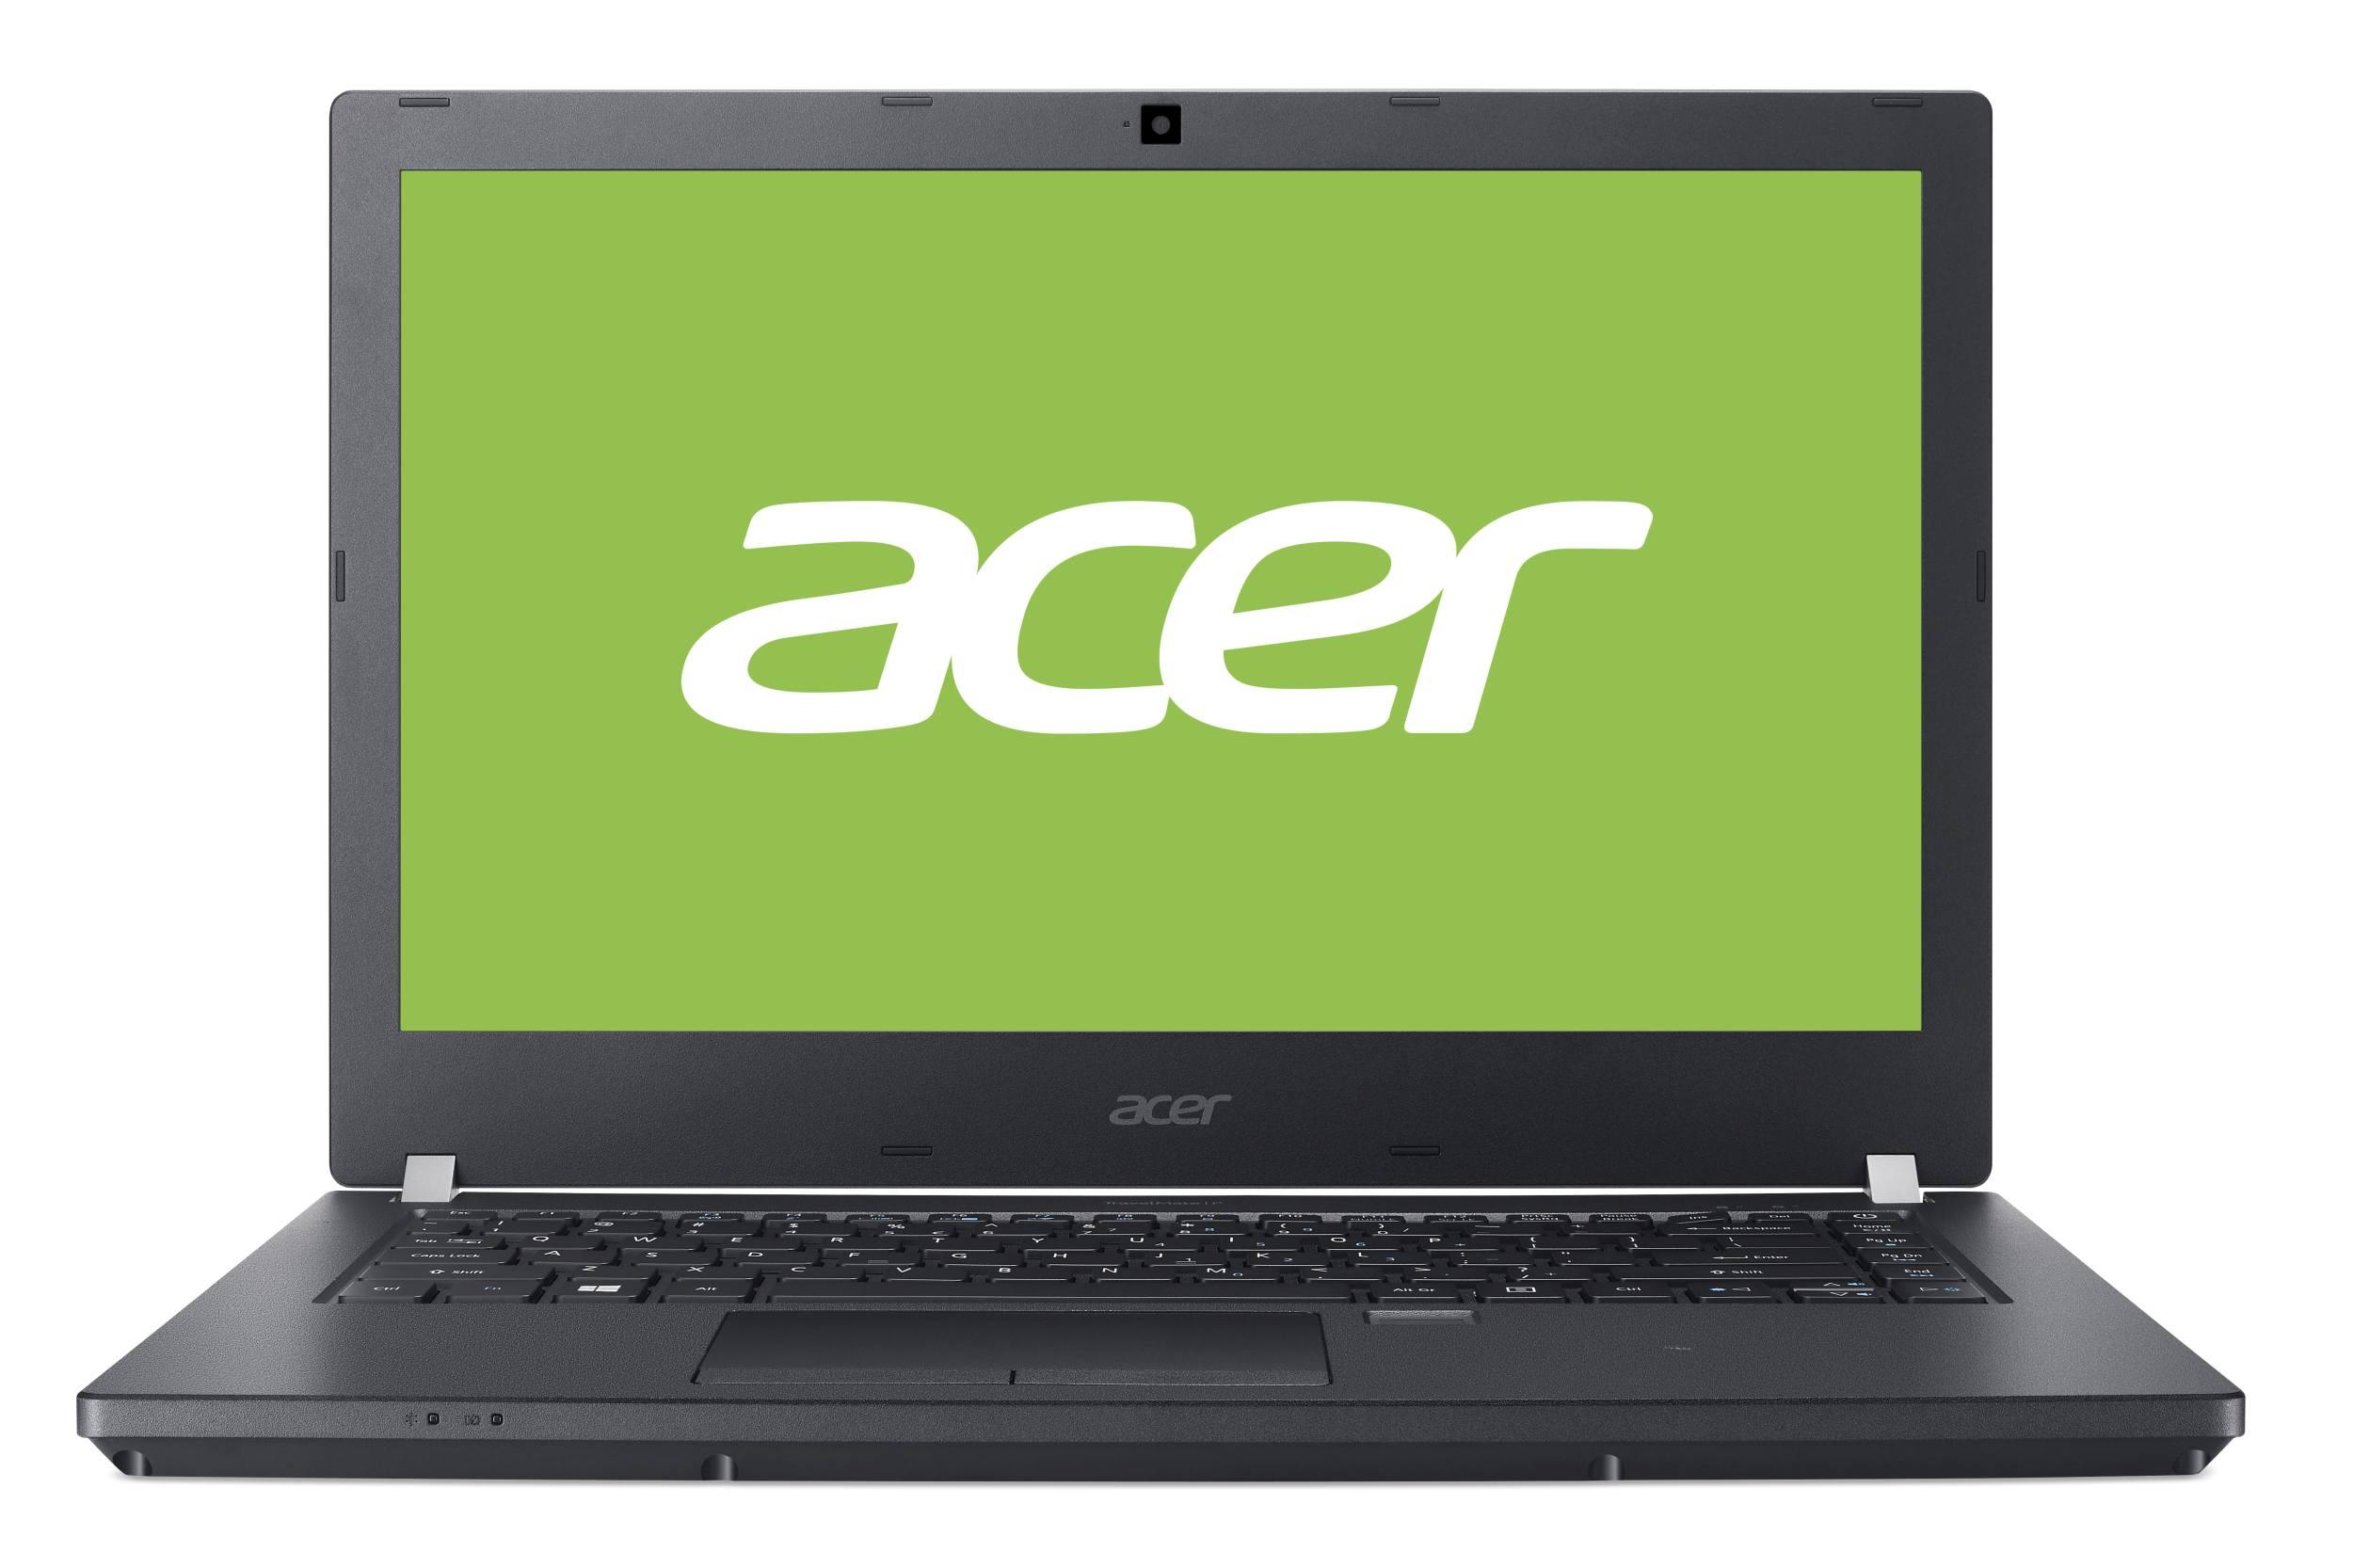 "AcerTravelMate TMP449-G2-M-56V9 i5-7200U/4GB+4GB/256GB PCIe SSD+N/HD Graphics/14"" FHD matný IPS LED/W10 Pro/Black"